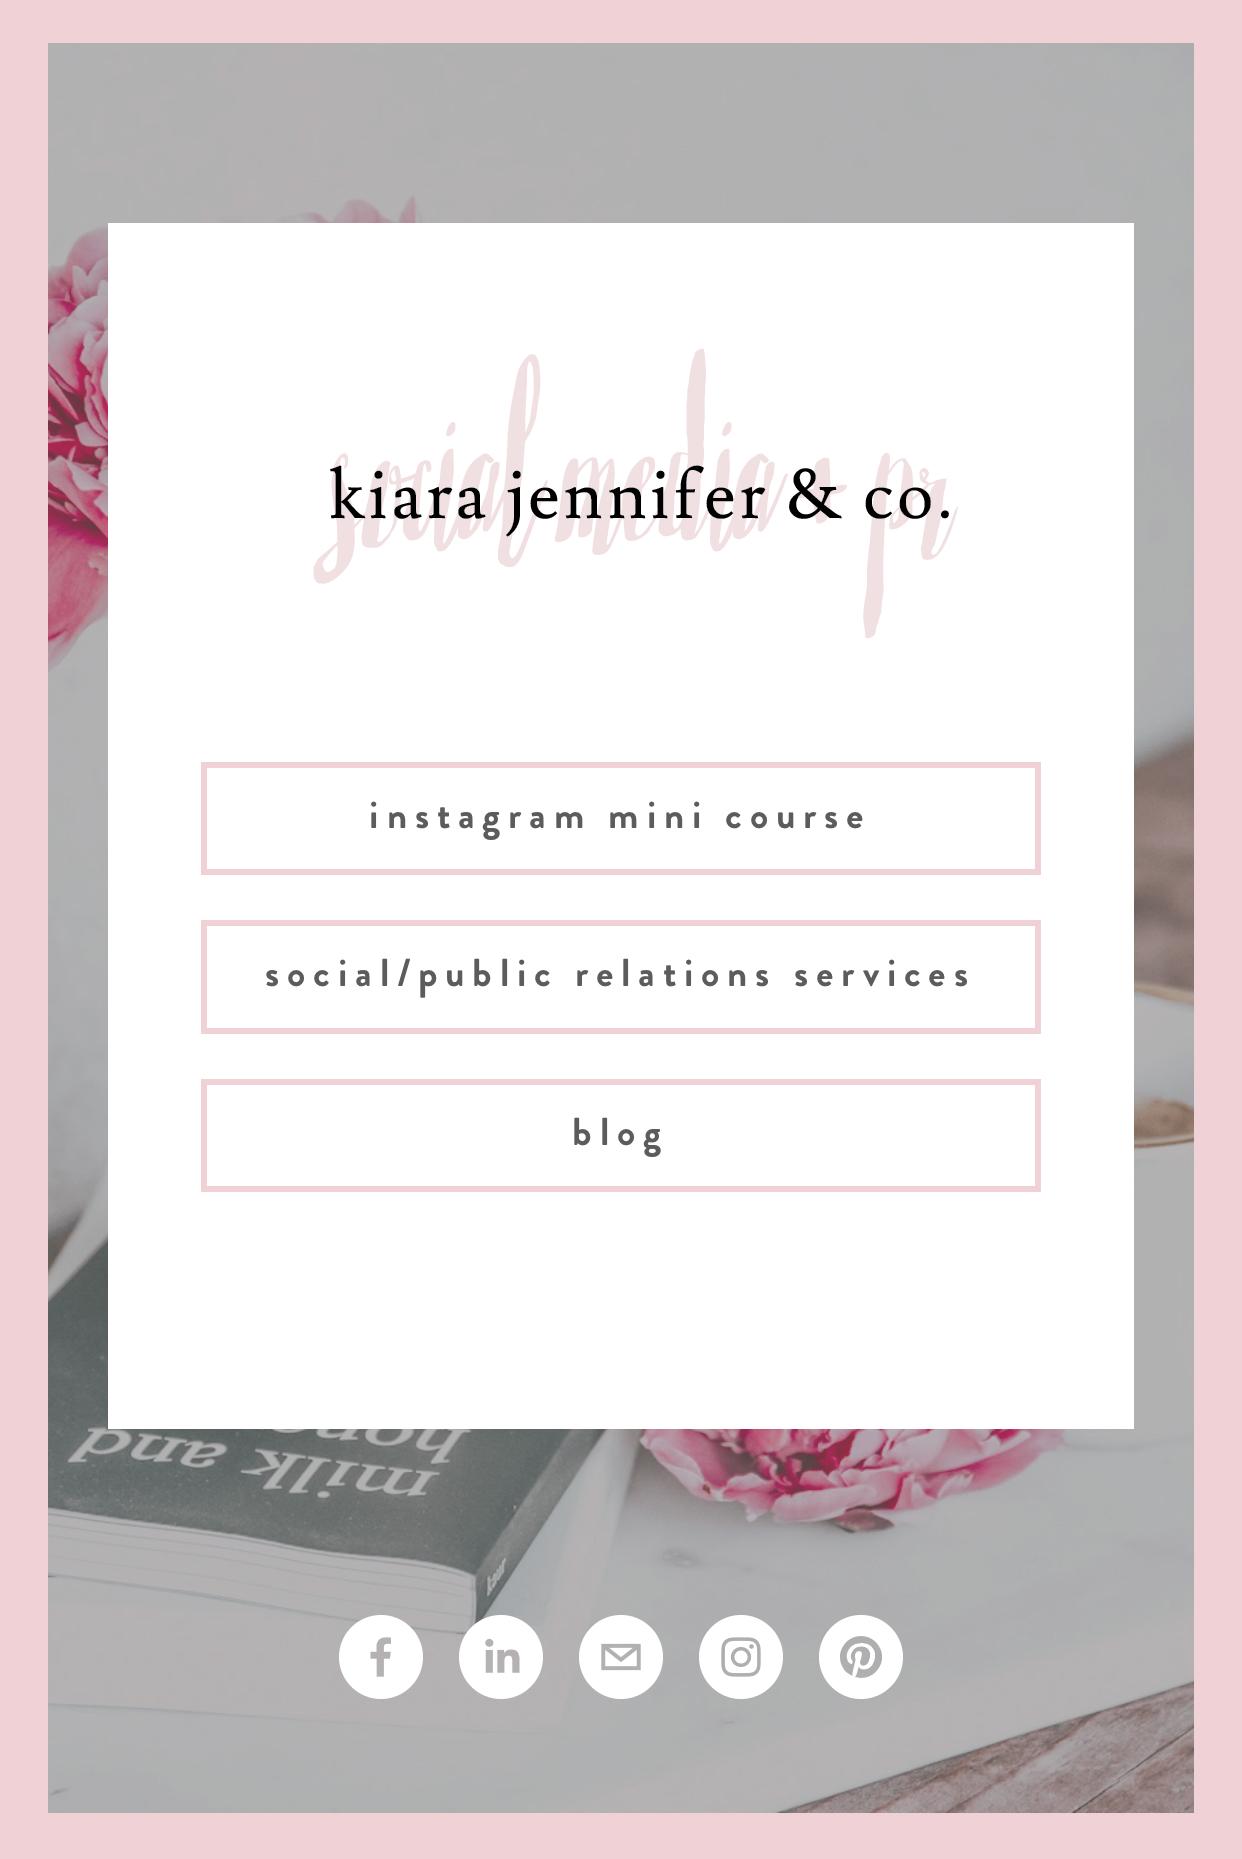 Social Media Linktree Instagram Hack | kiara jennifer and co social media marketing and public relations